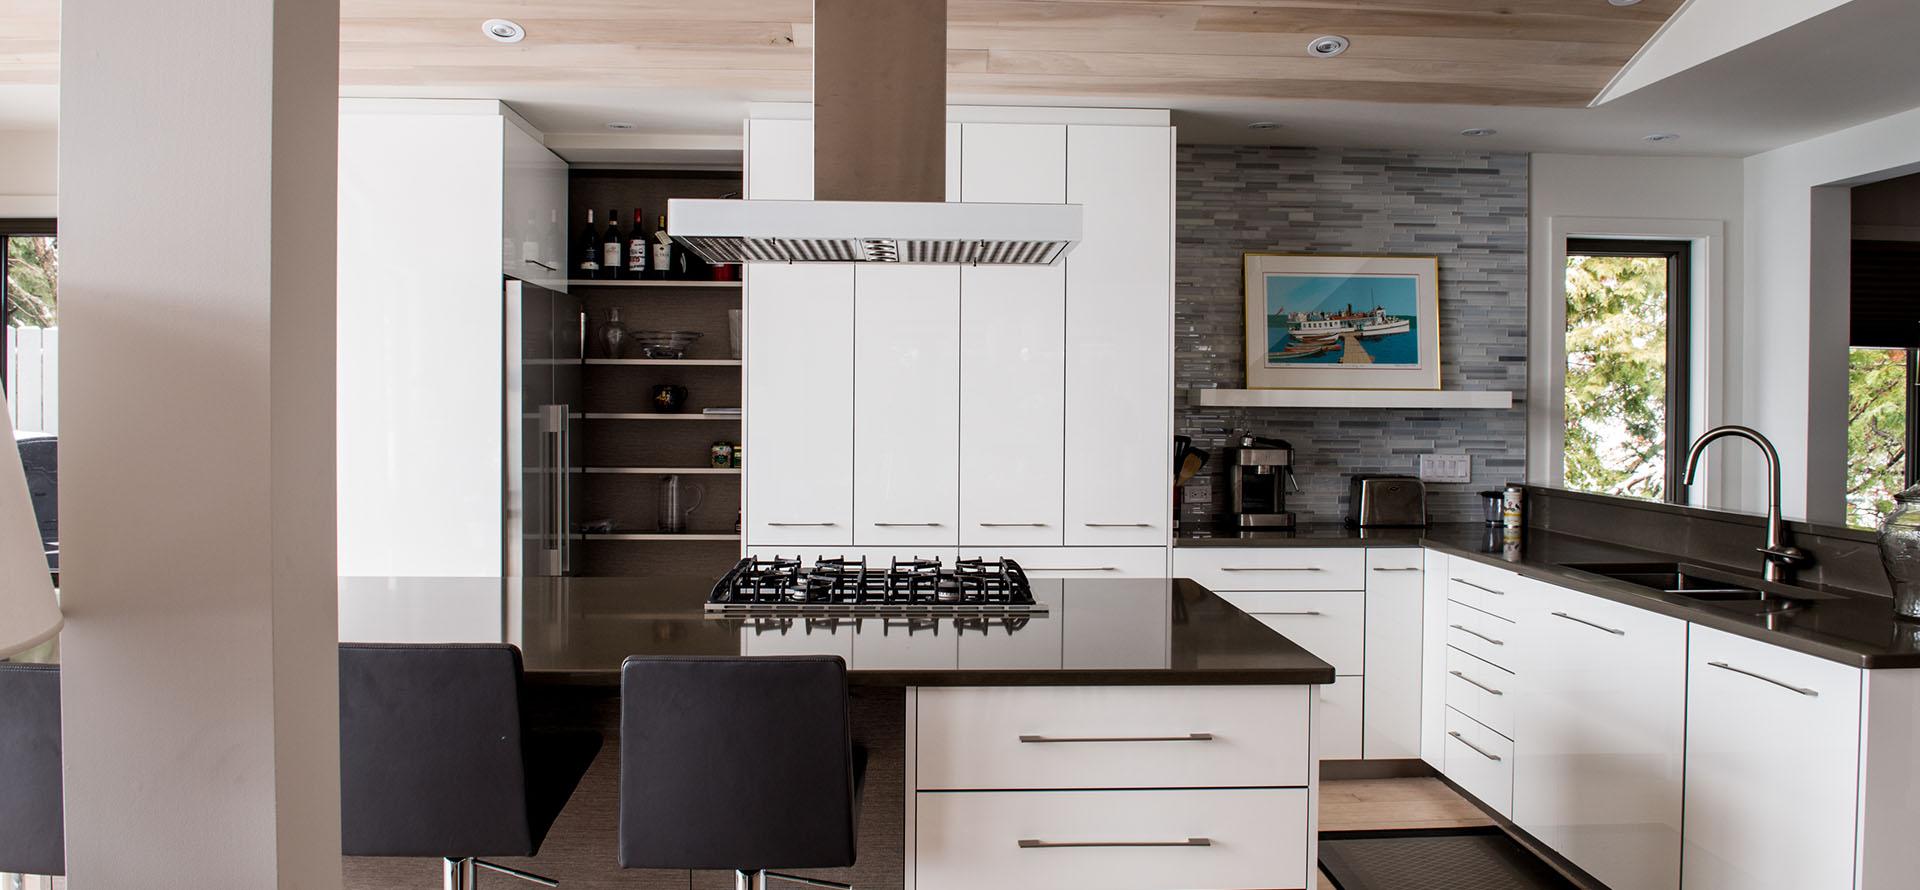 Cuisine Design Hotte : Cuisine Moderne Sherbrooke (Roubaix 21)  Design